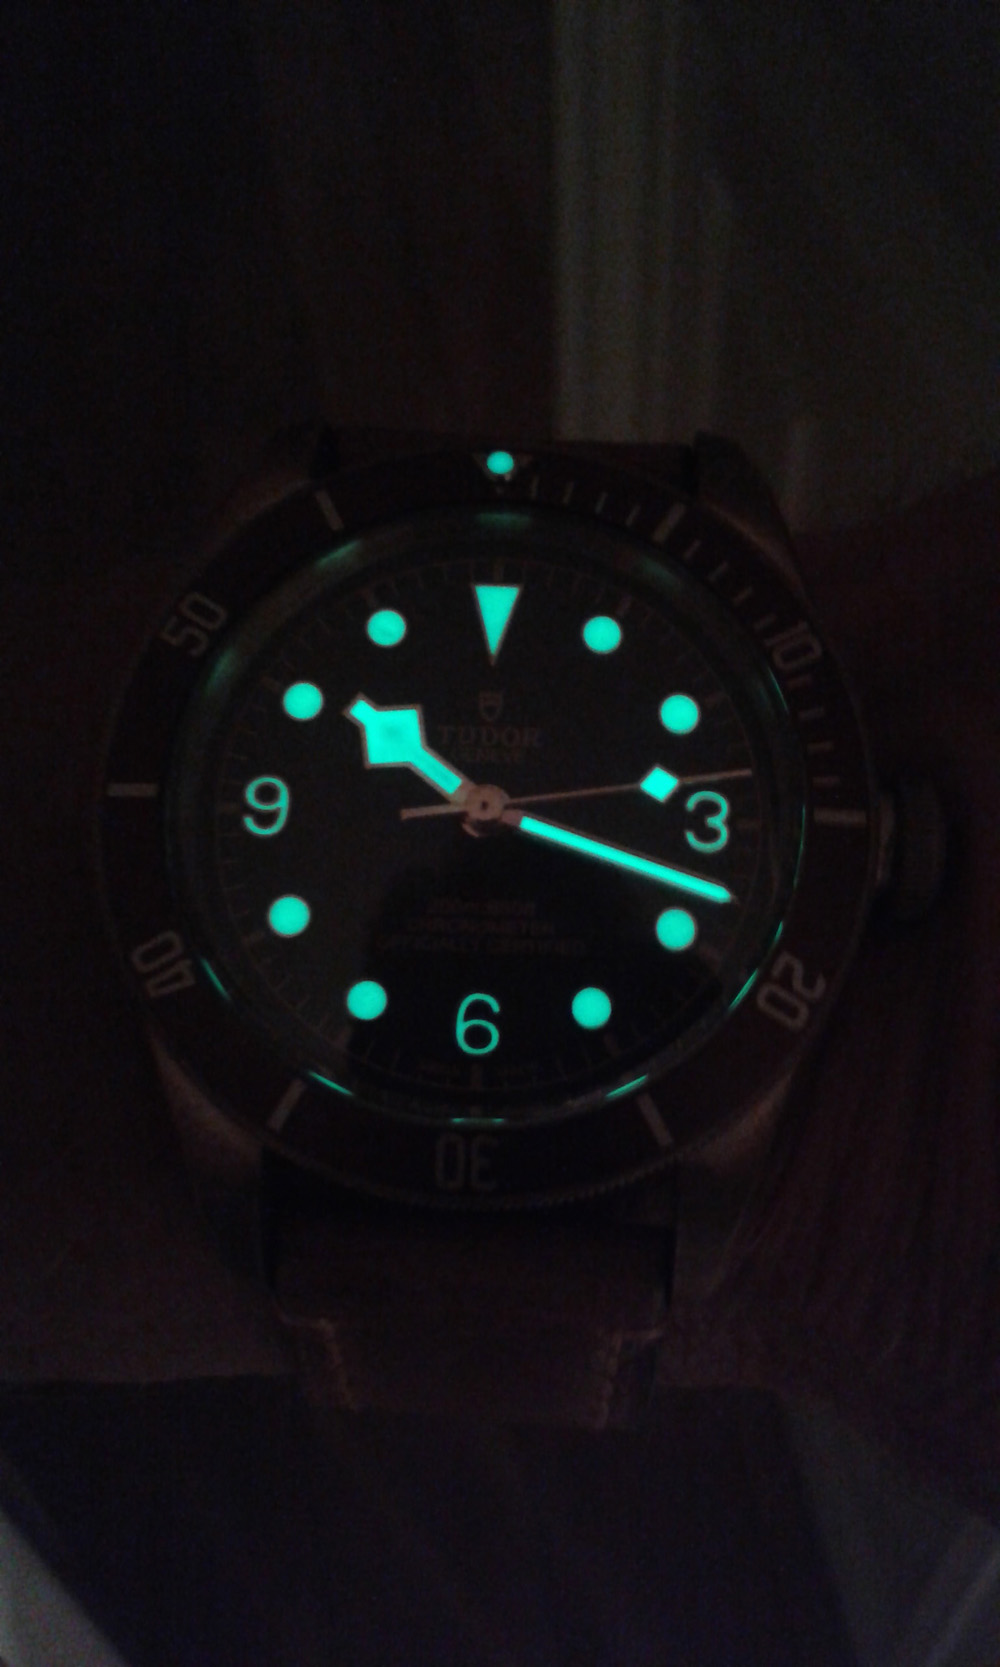 Tudor watch lume dial